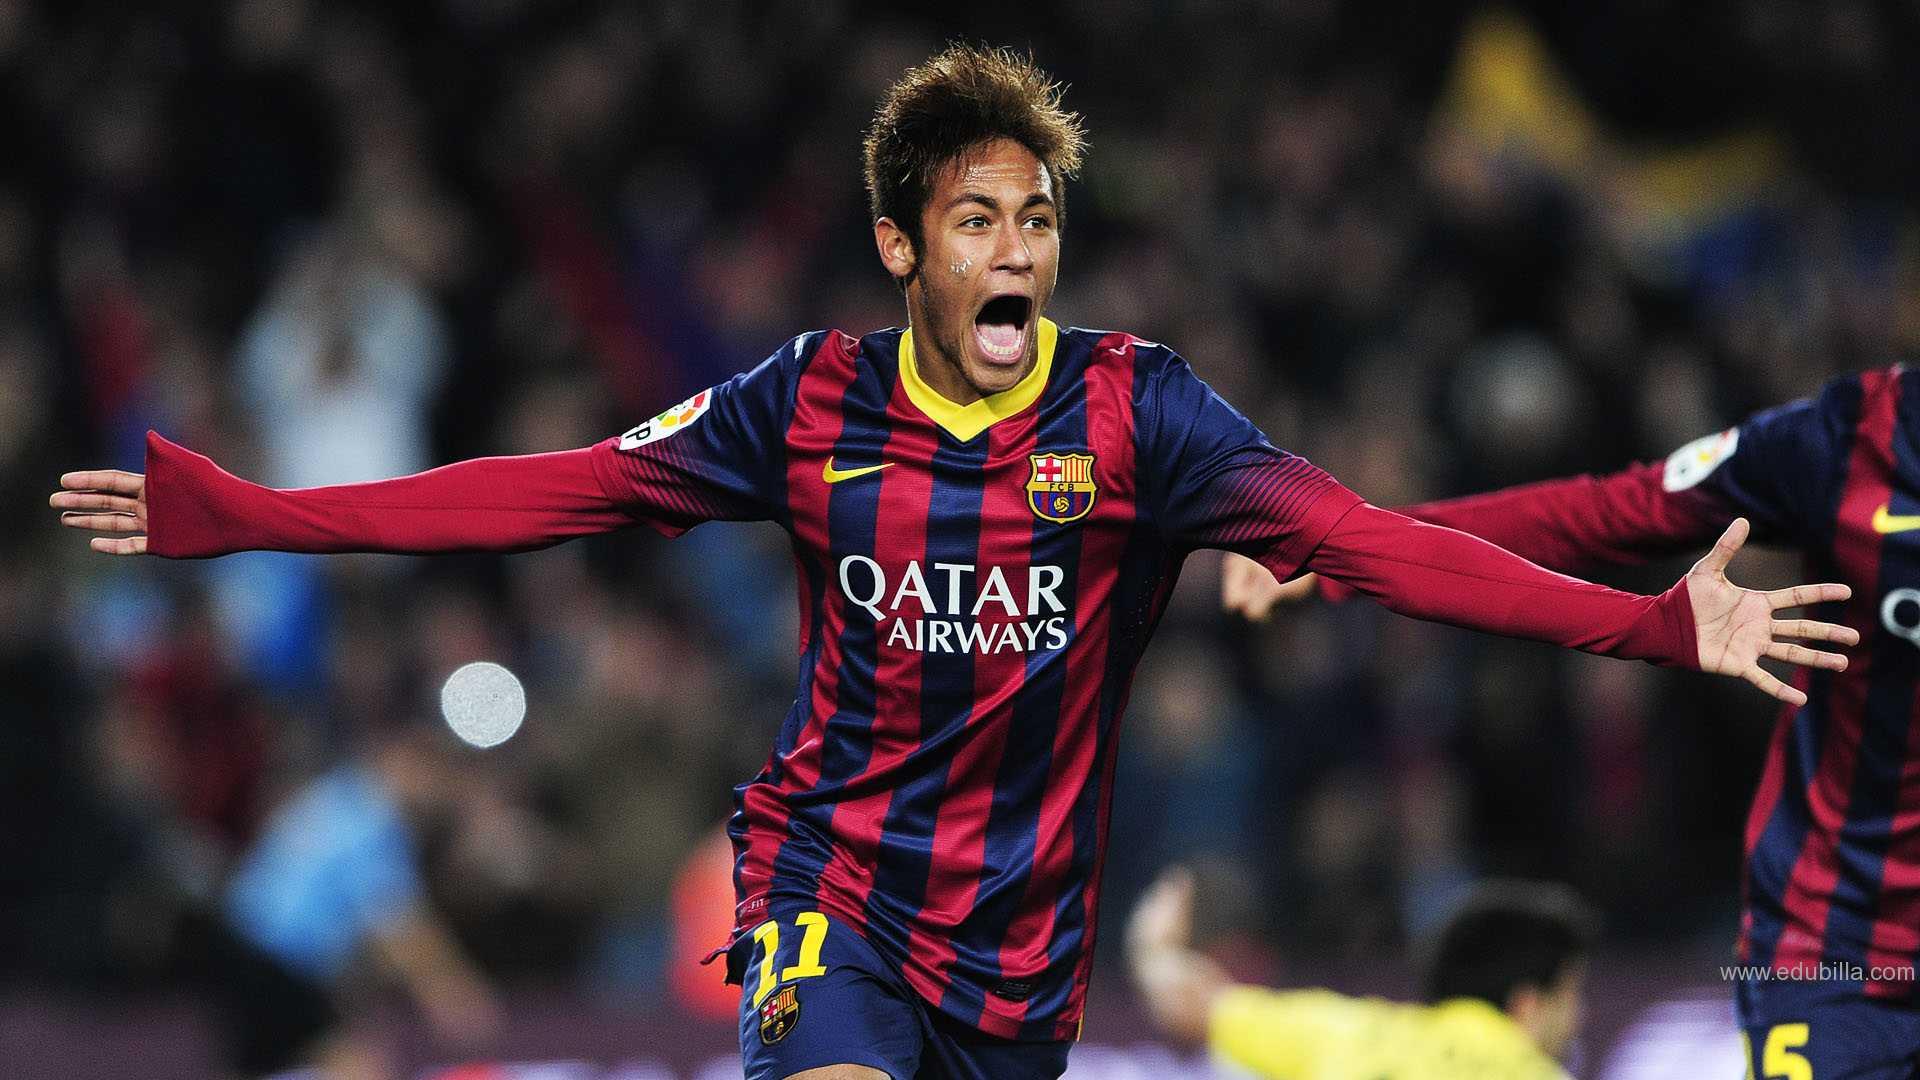 Neymar Biography Neymar Achievements Neymar Career Stats Edubilla Com